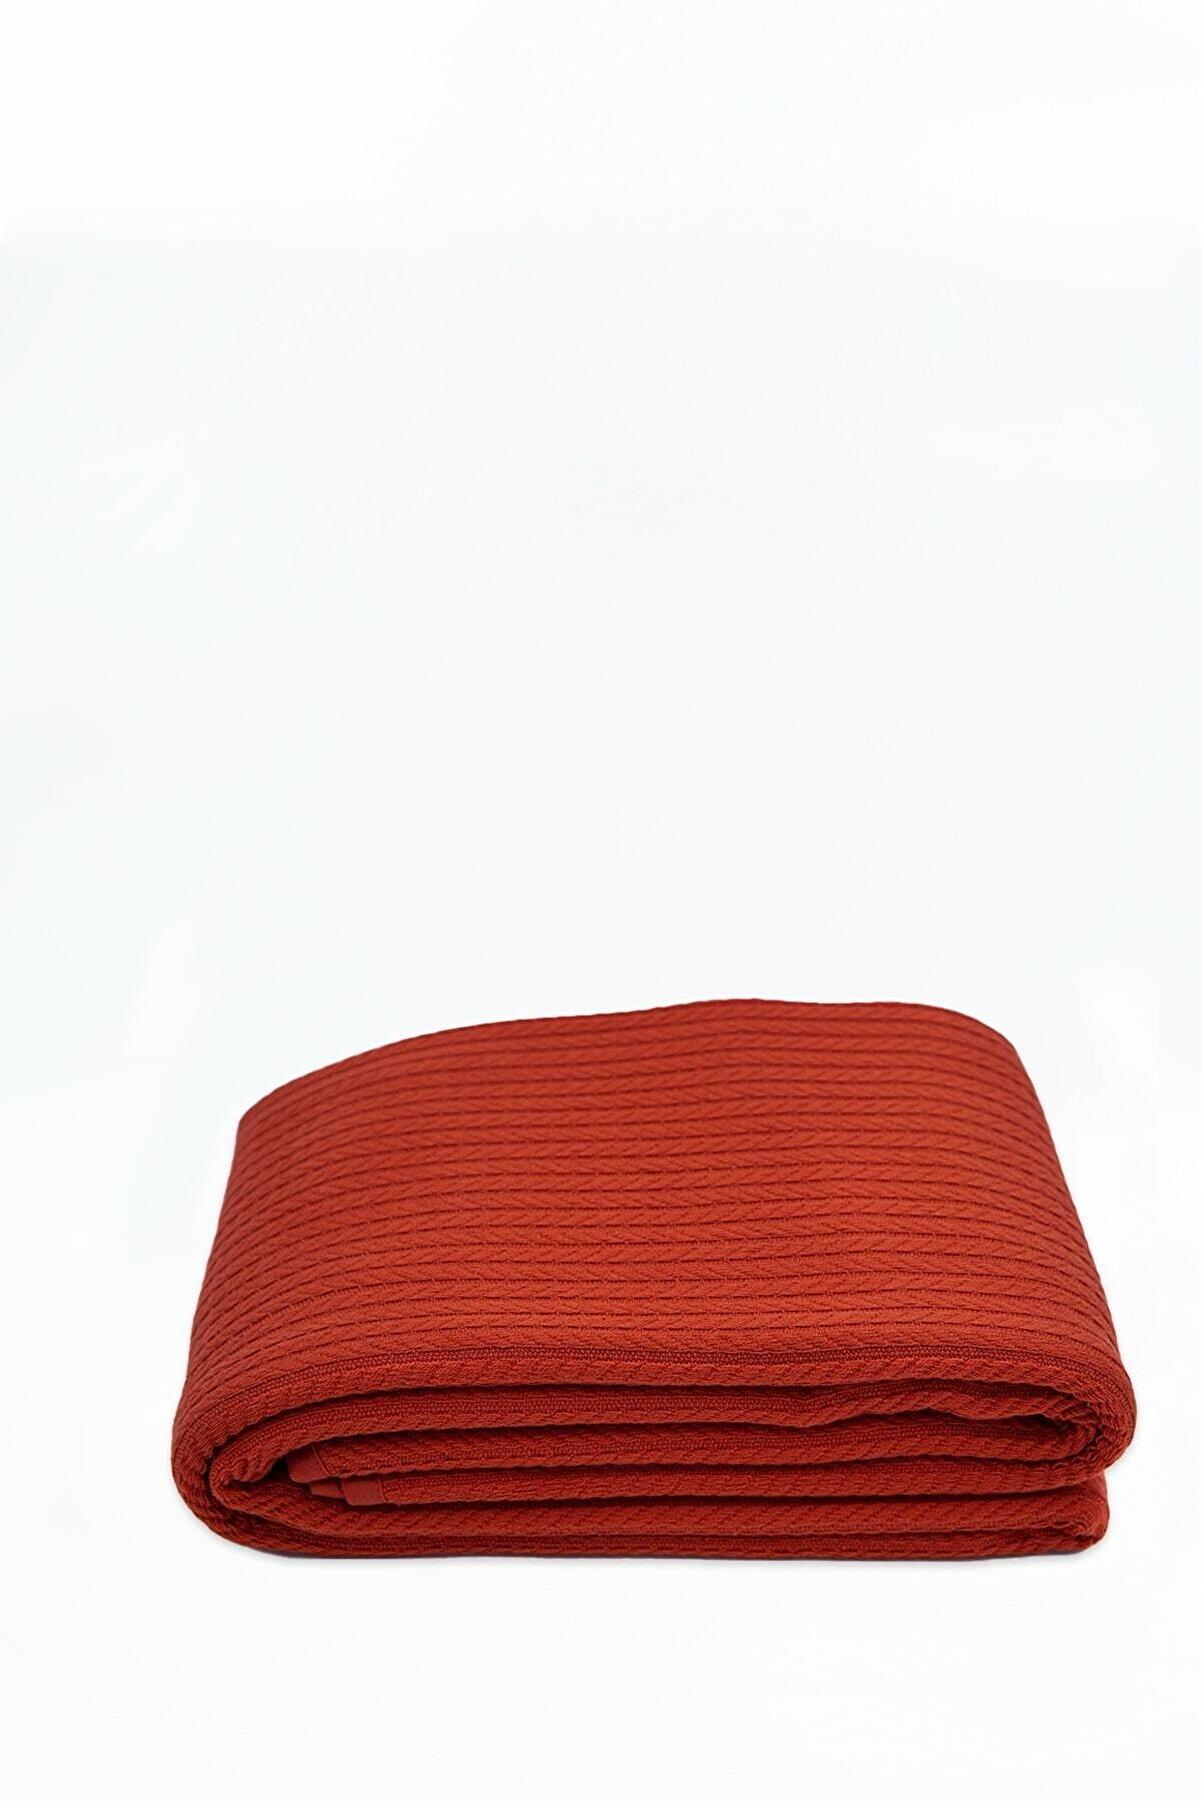 Tekstil Home Paris Serisi Tek Kişilik Örgü Pike Kiremit